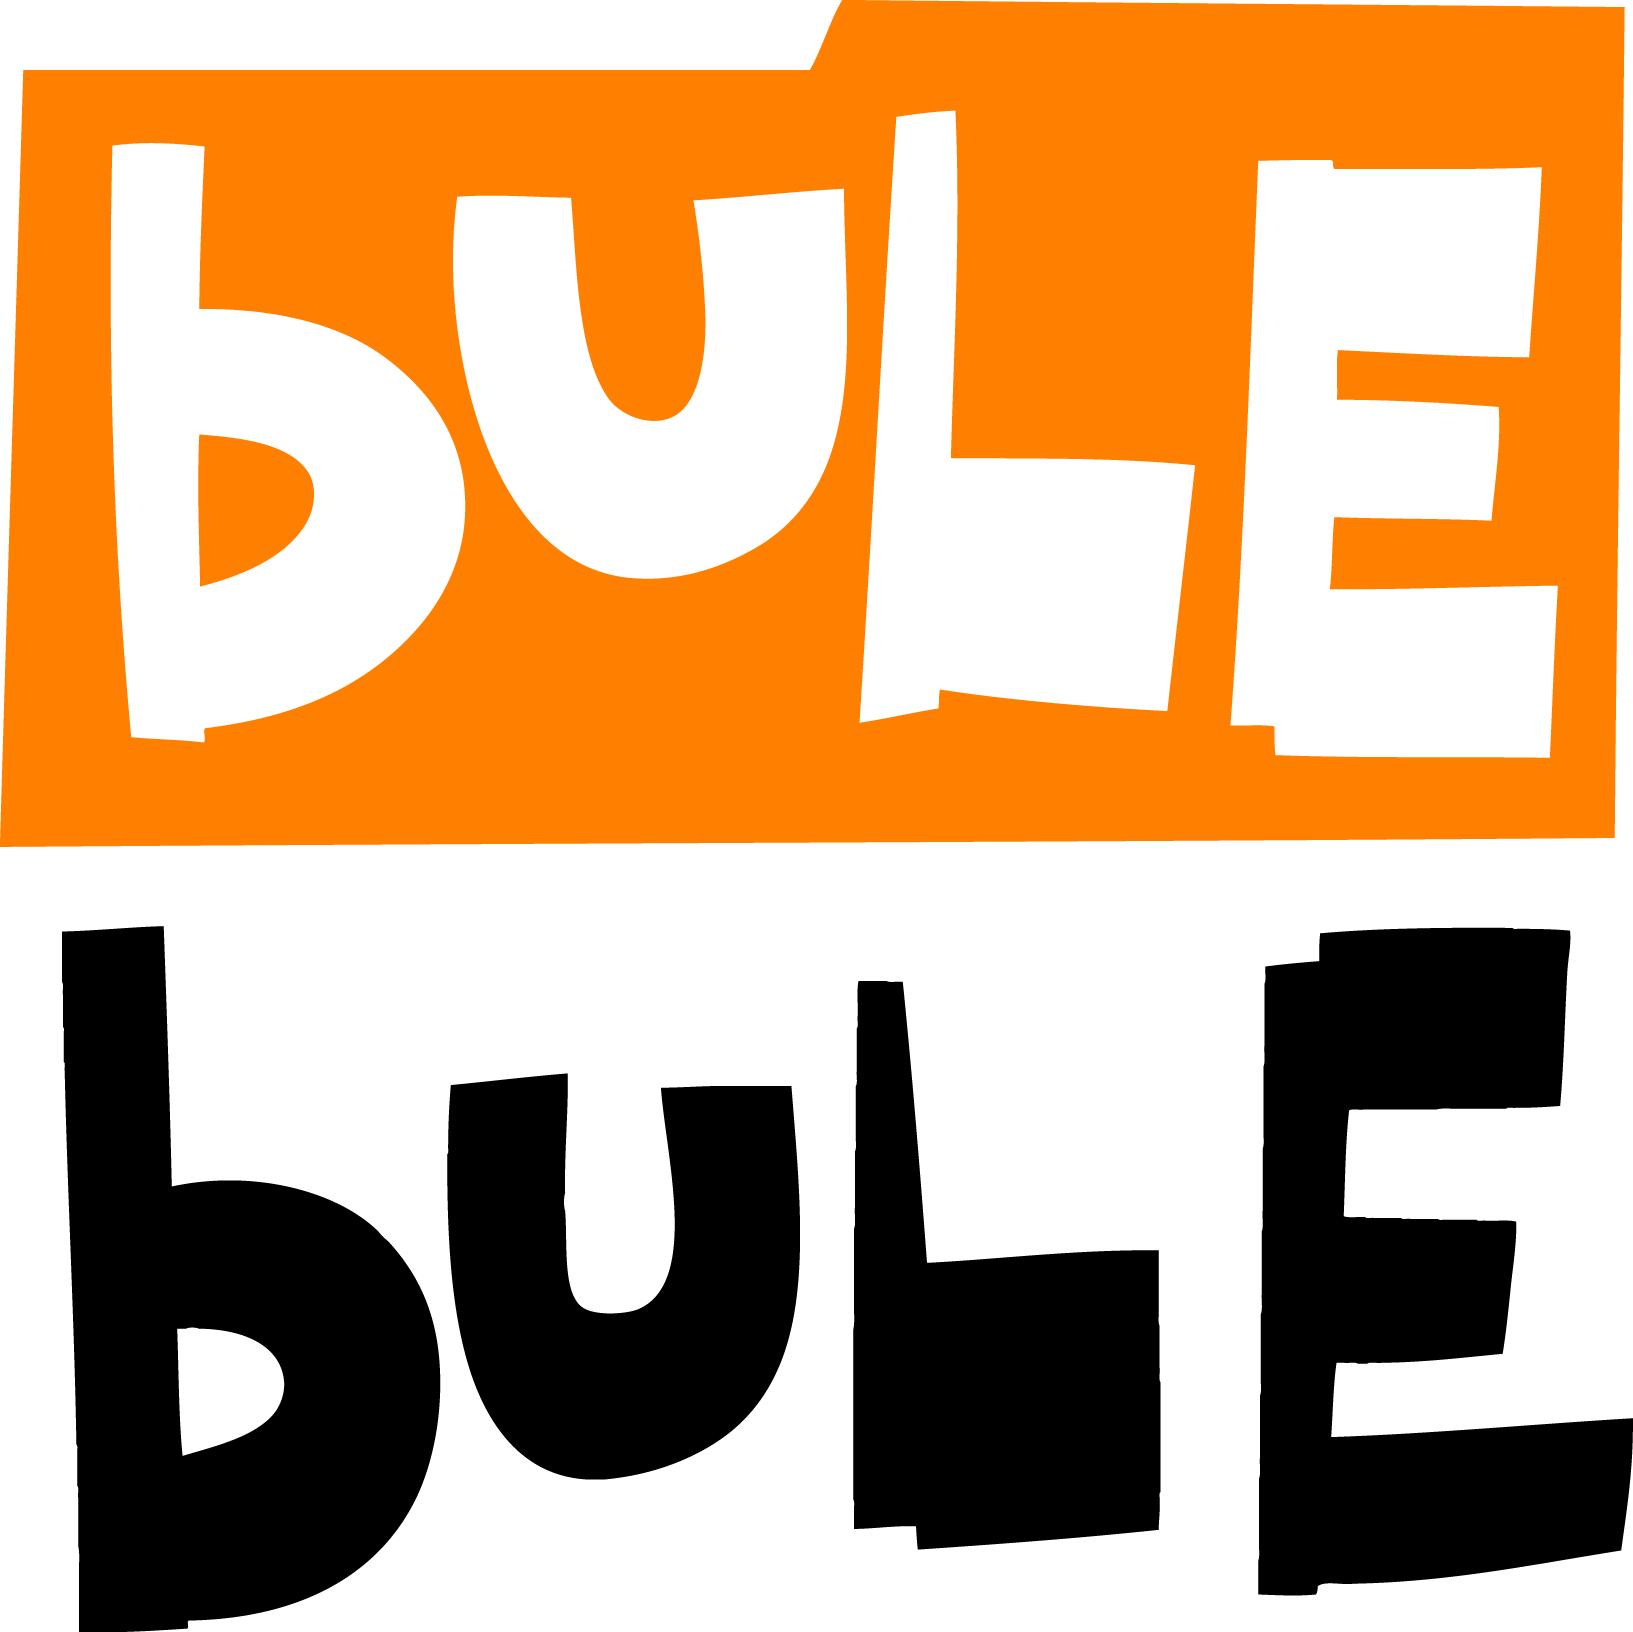 Logotipo Bule Bule